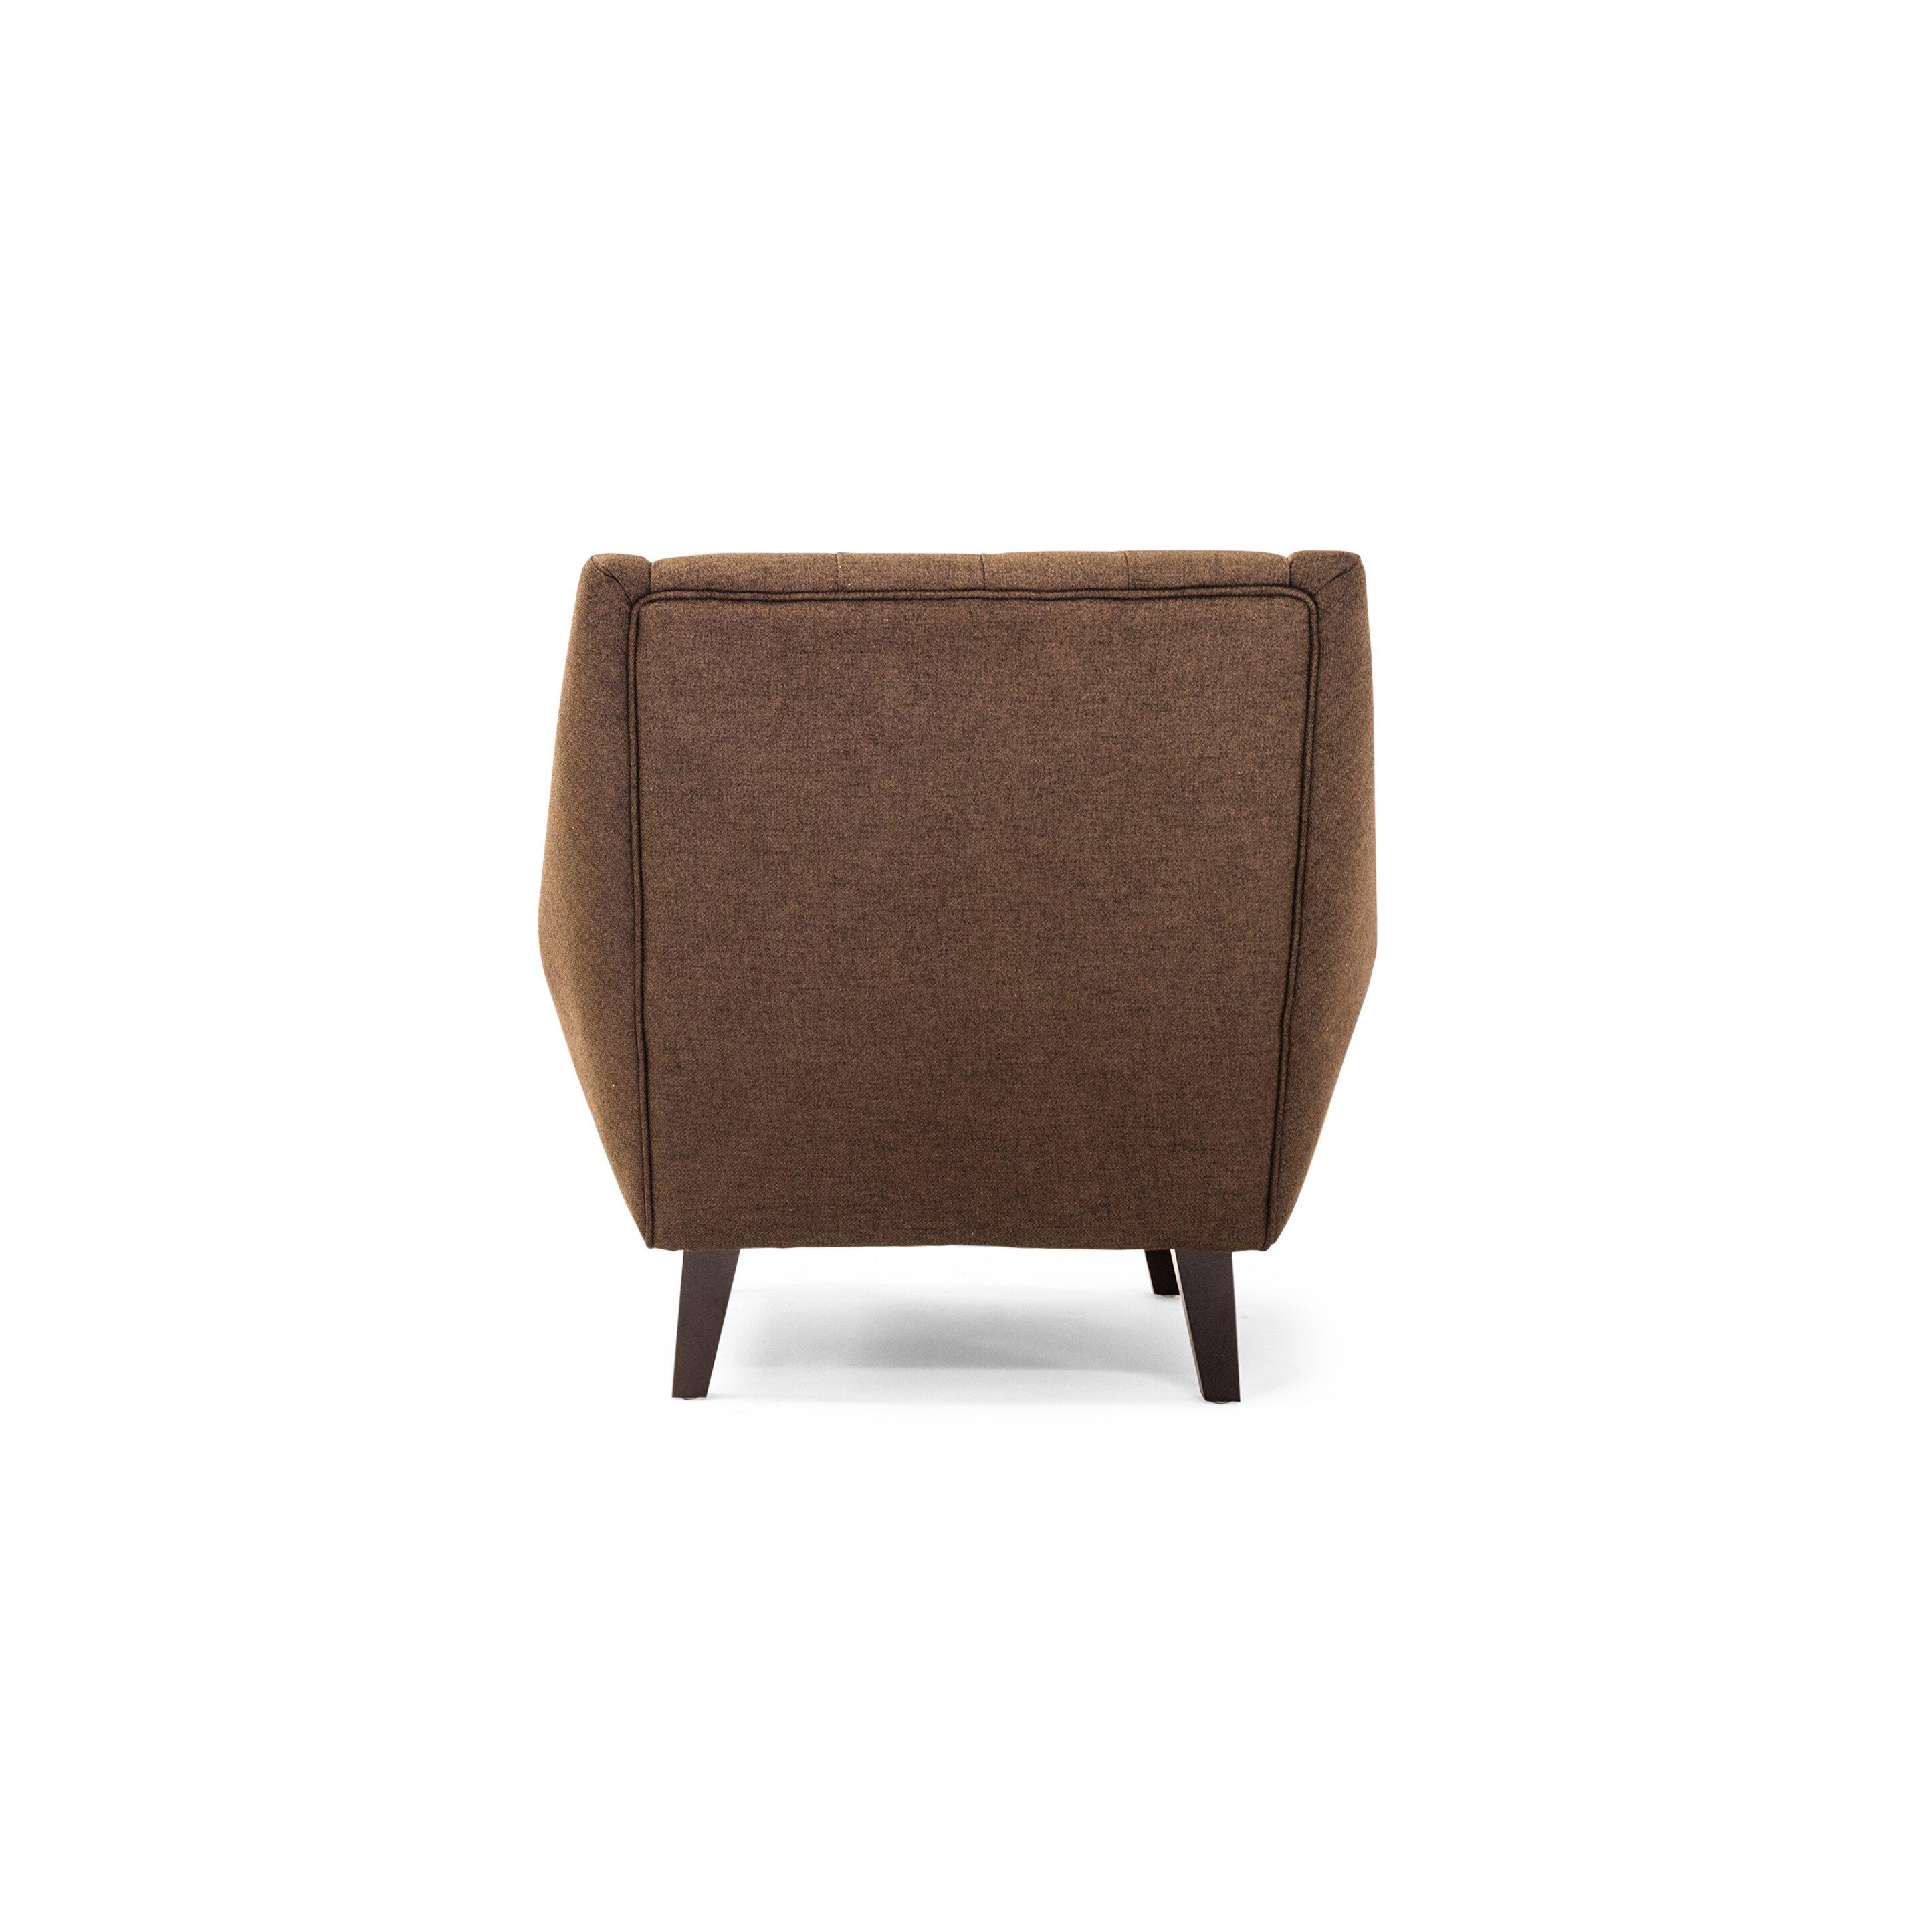 Kar l Stuart Lounge Chair and Ottoman